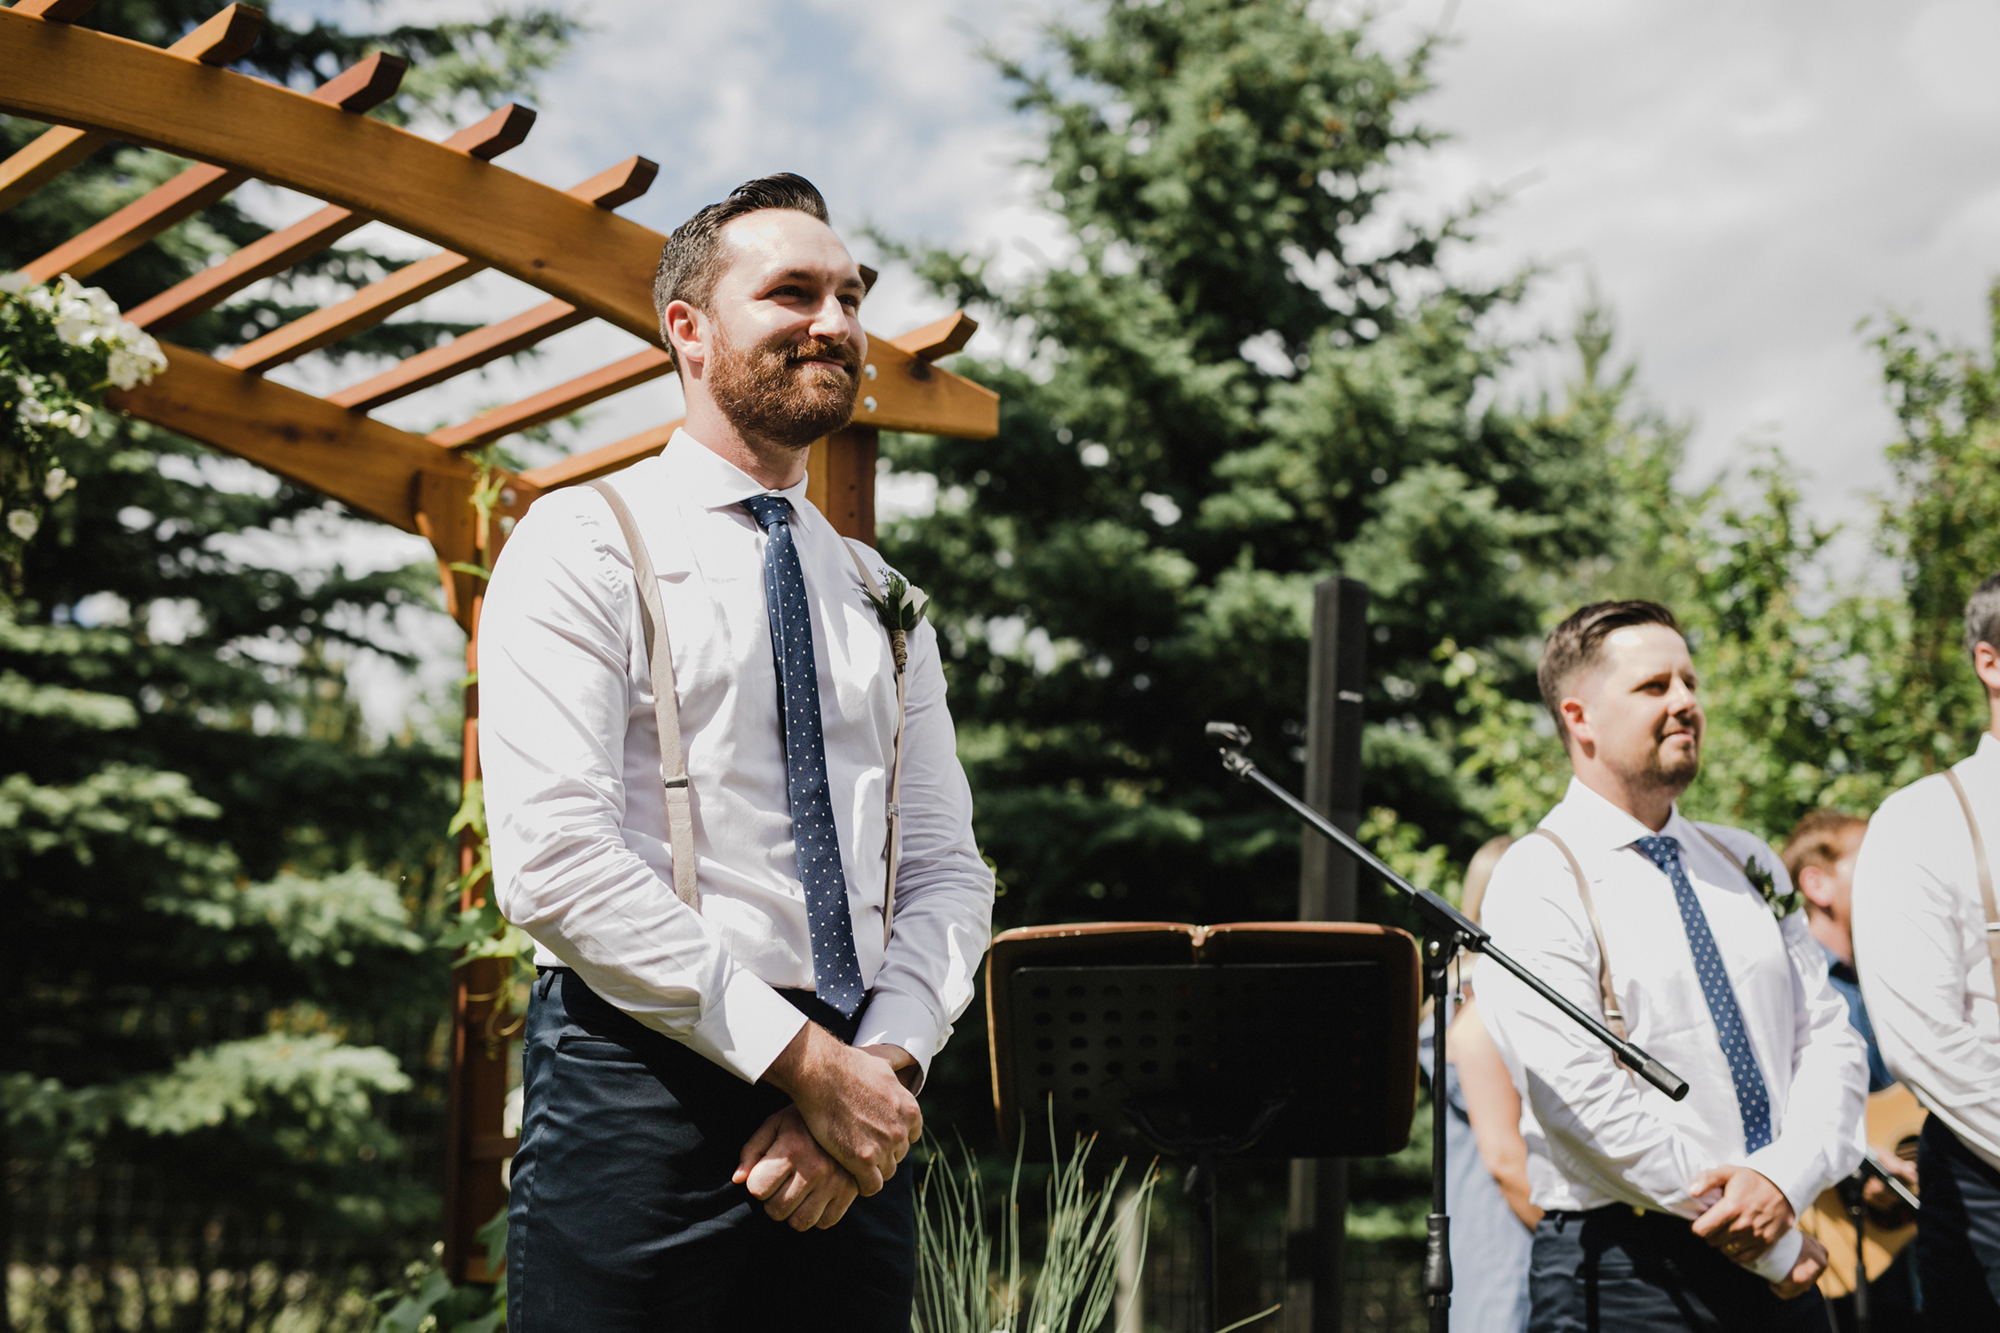 Flower Farm Crowsnest Pass Wedding -049.JPG